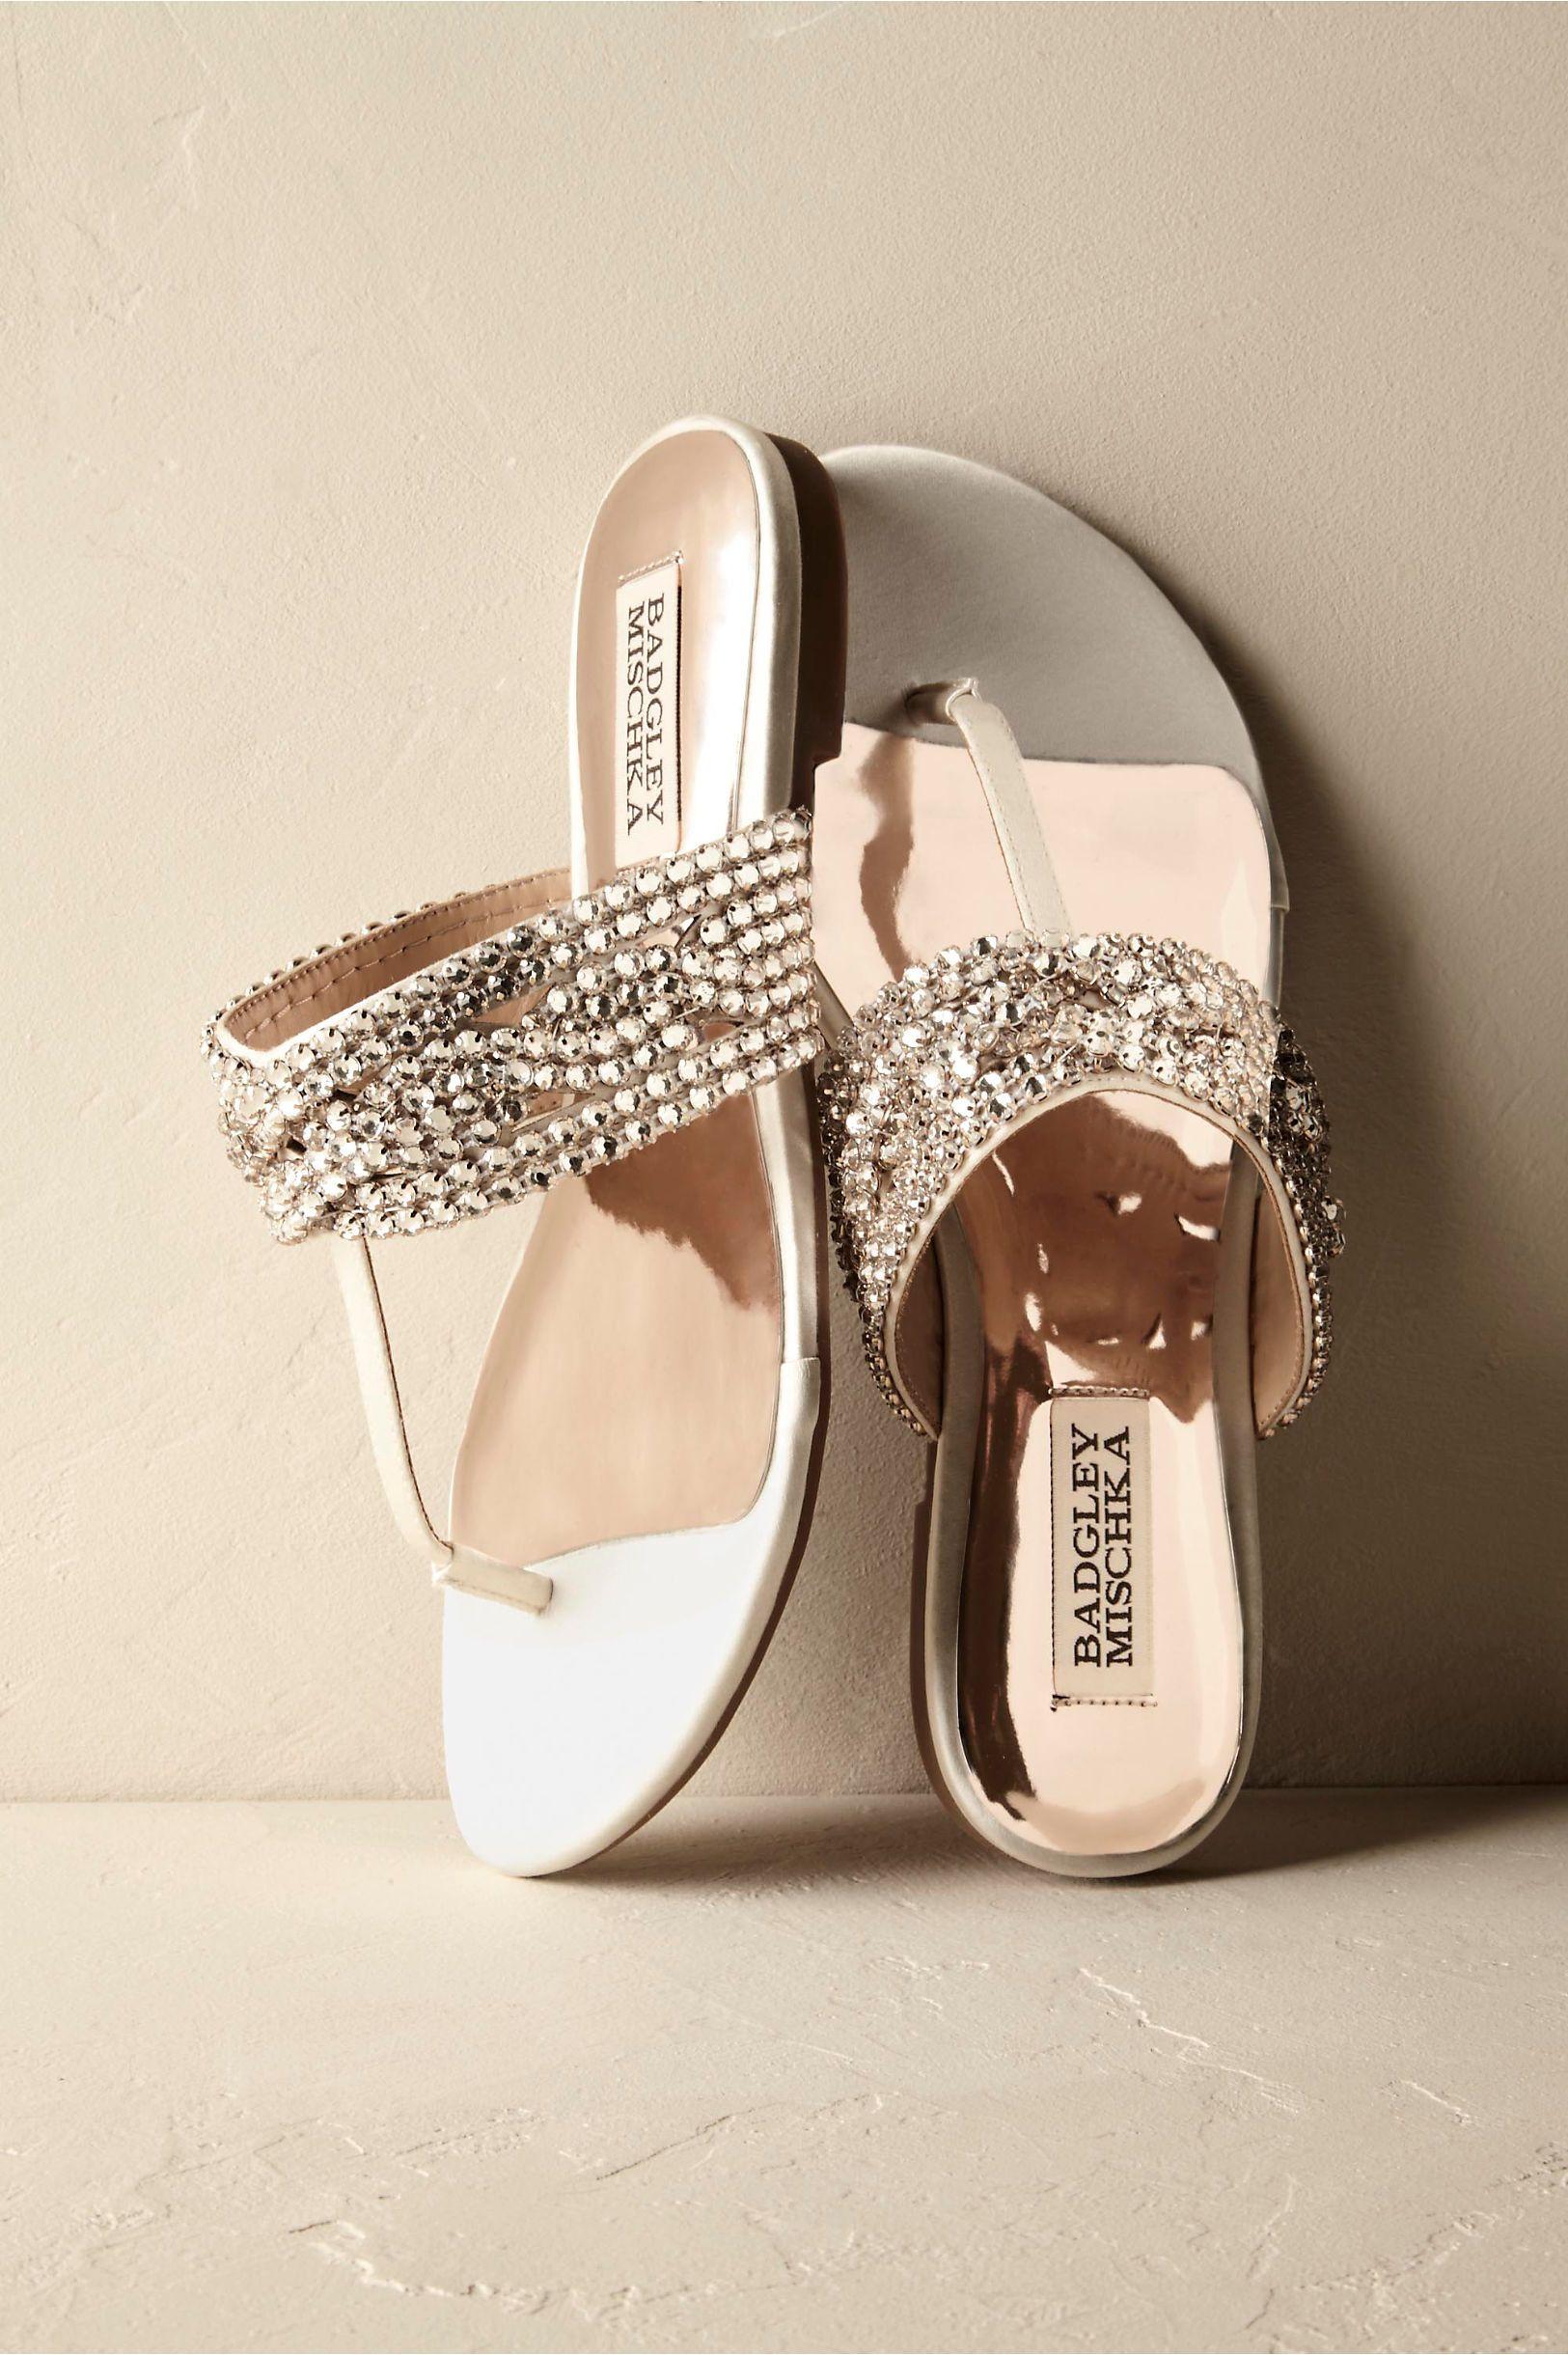 a7fd7b5cf BHLDN Giradot Sandals in Bride Bridal Shoes   Accessories Bridal Shoes